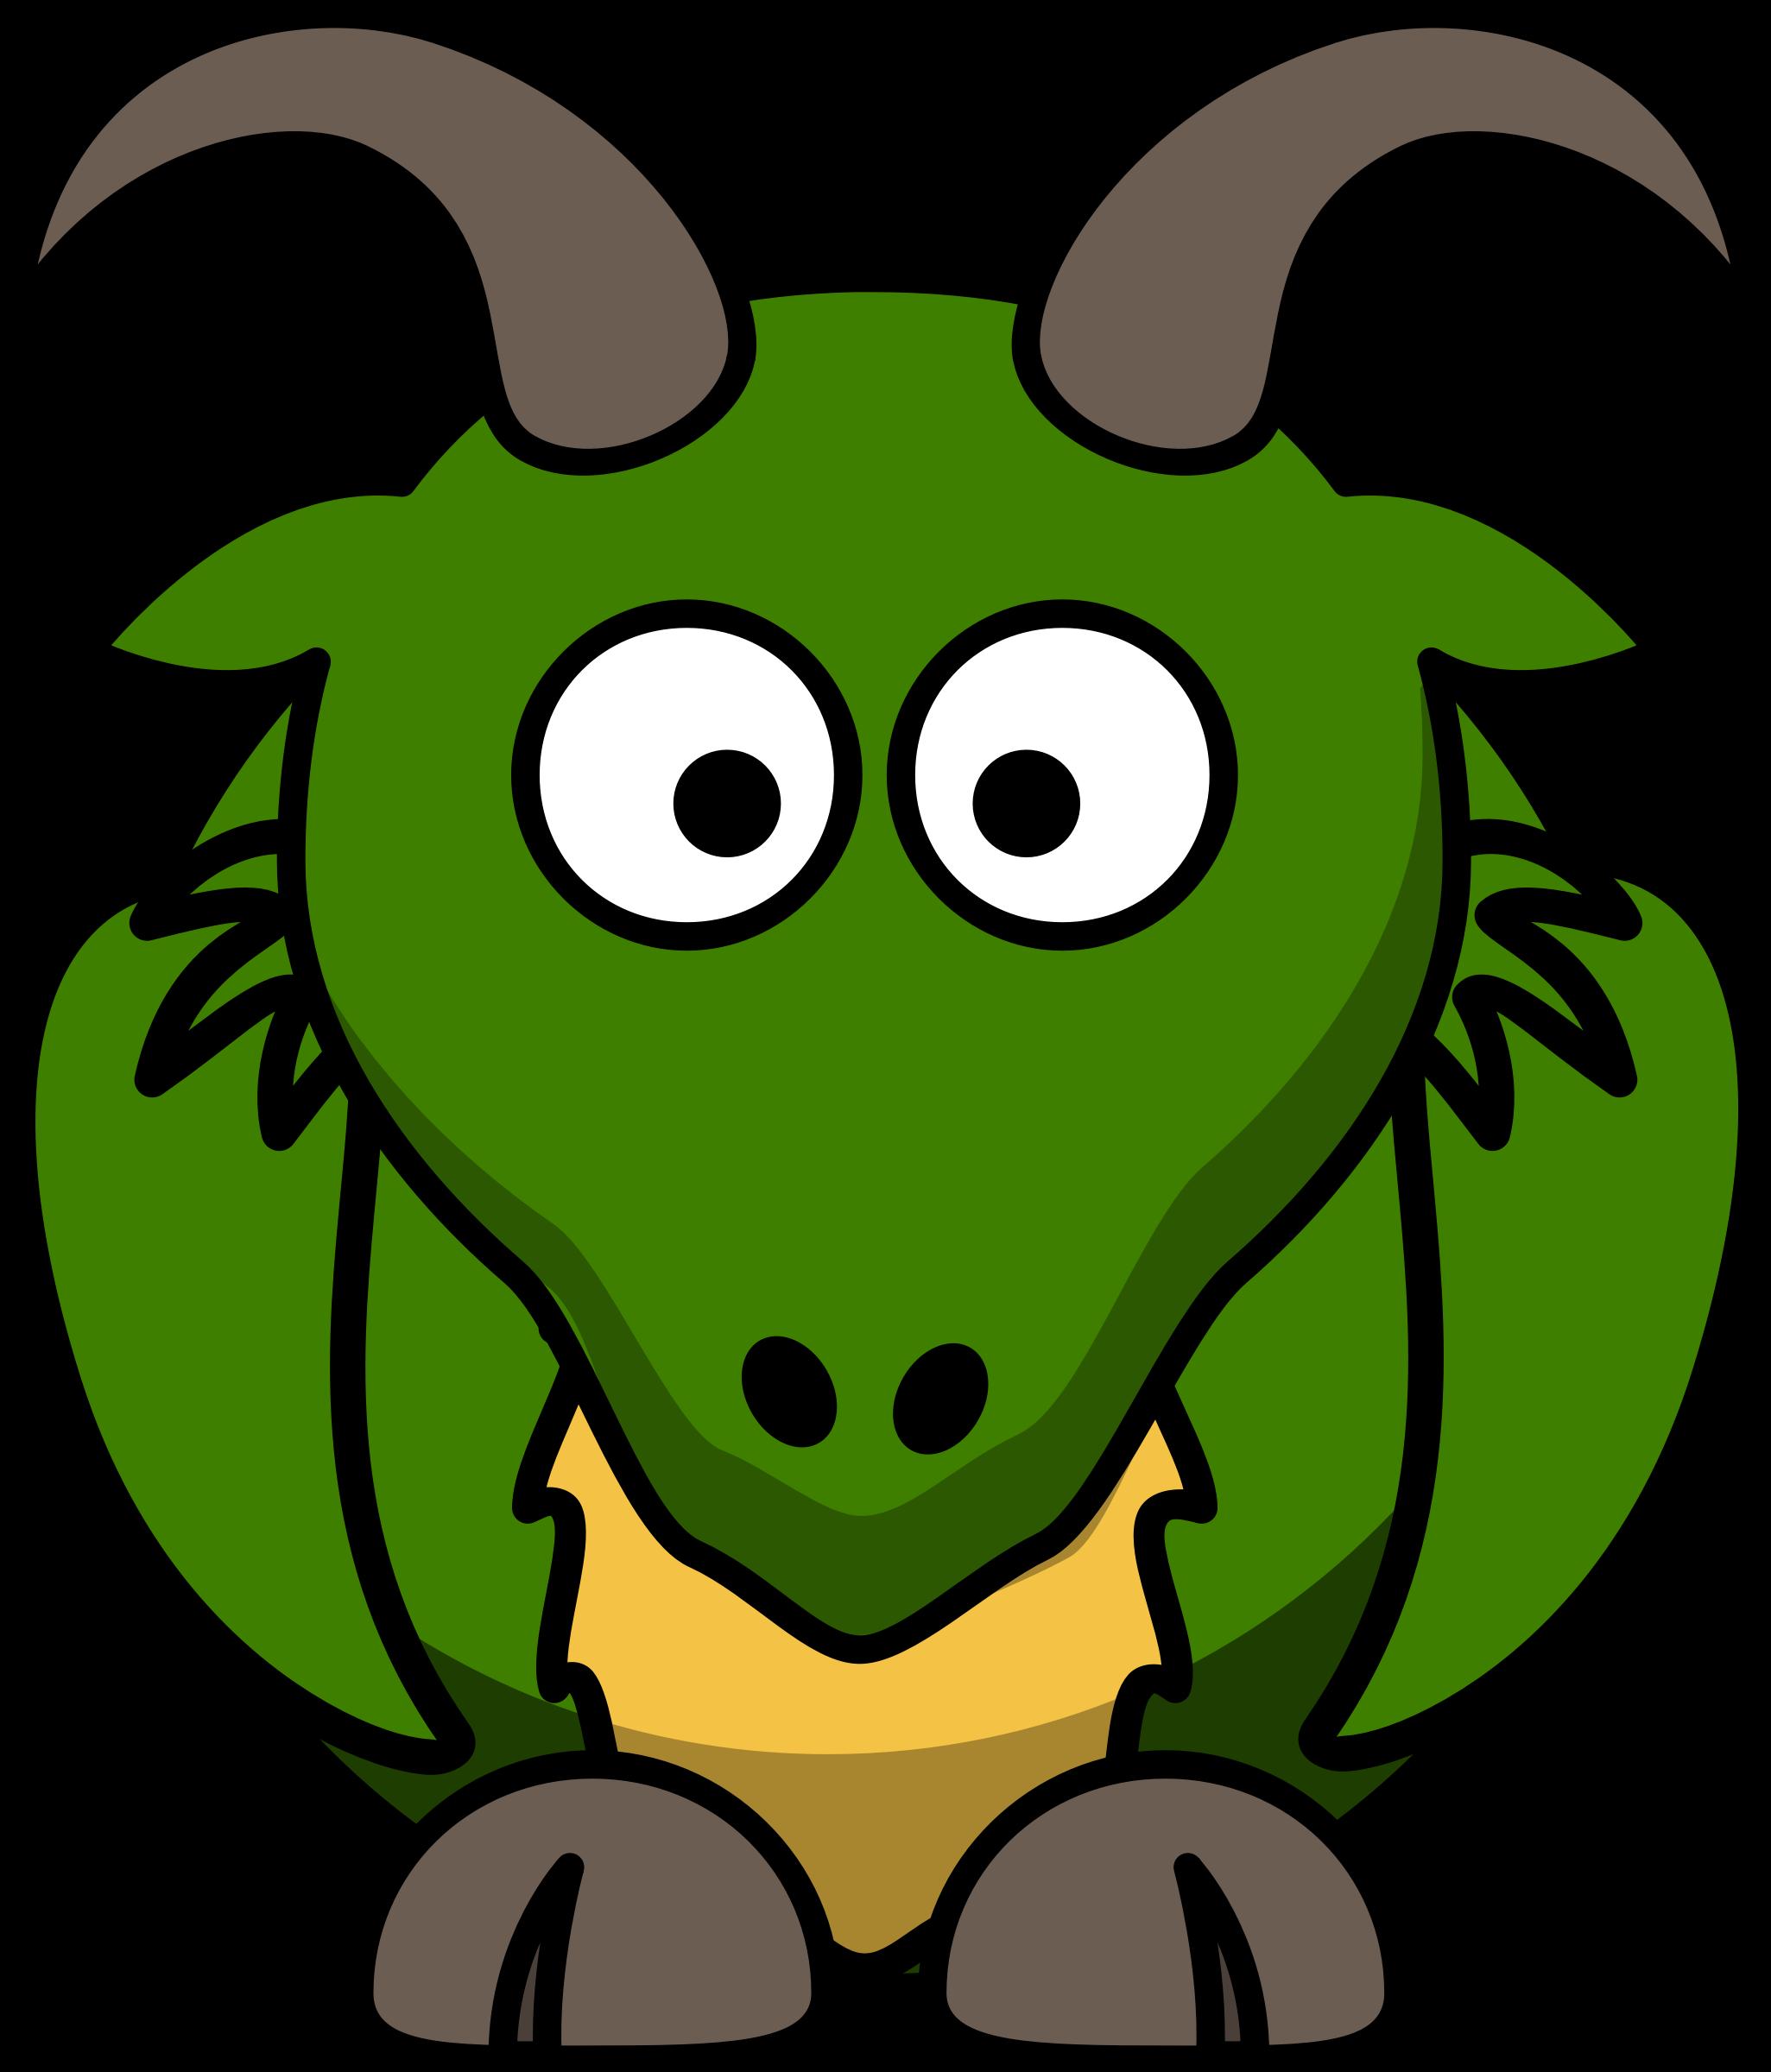 Cartoon dragon big image. Goat clipart toon